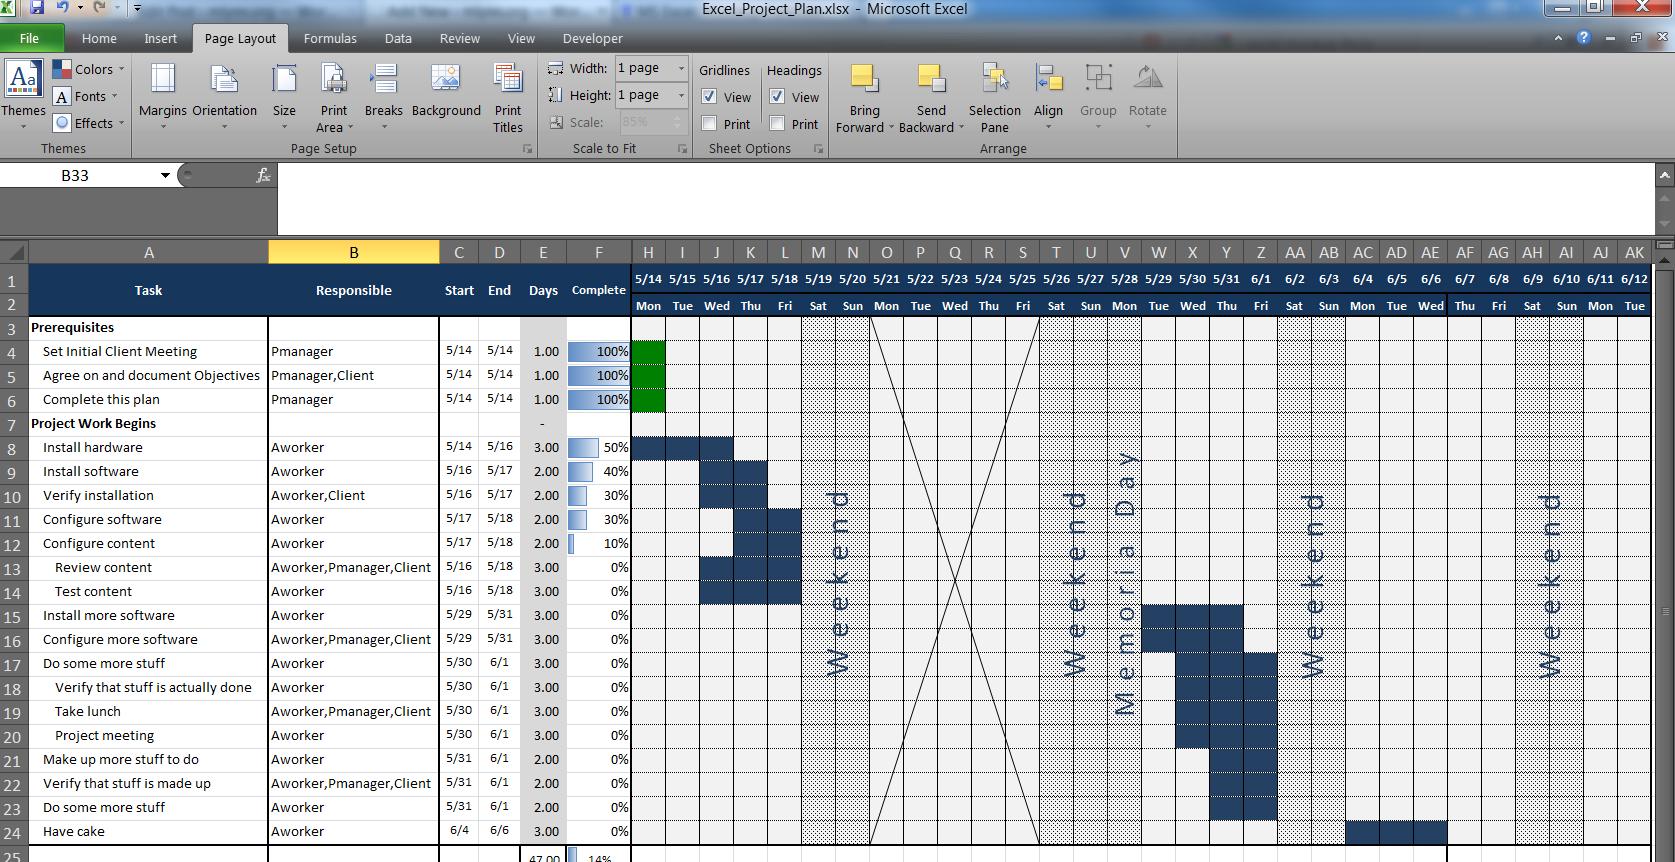 An Excel Project Planning Spreadsheet – MLYNN.ORG